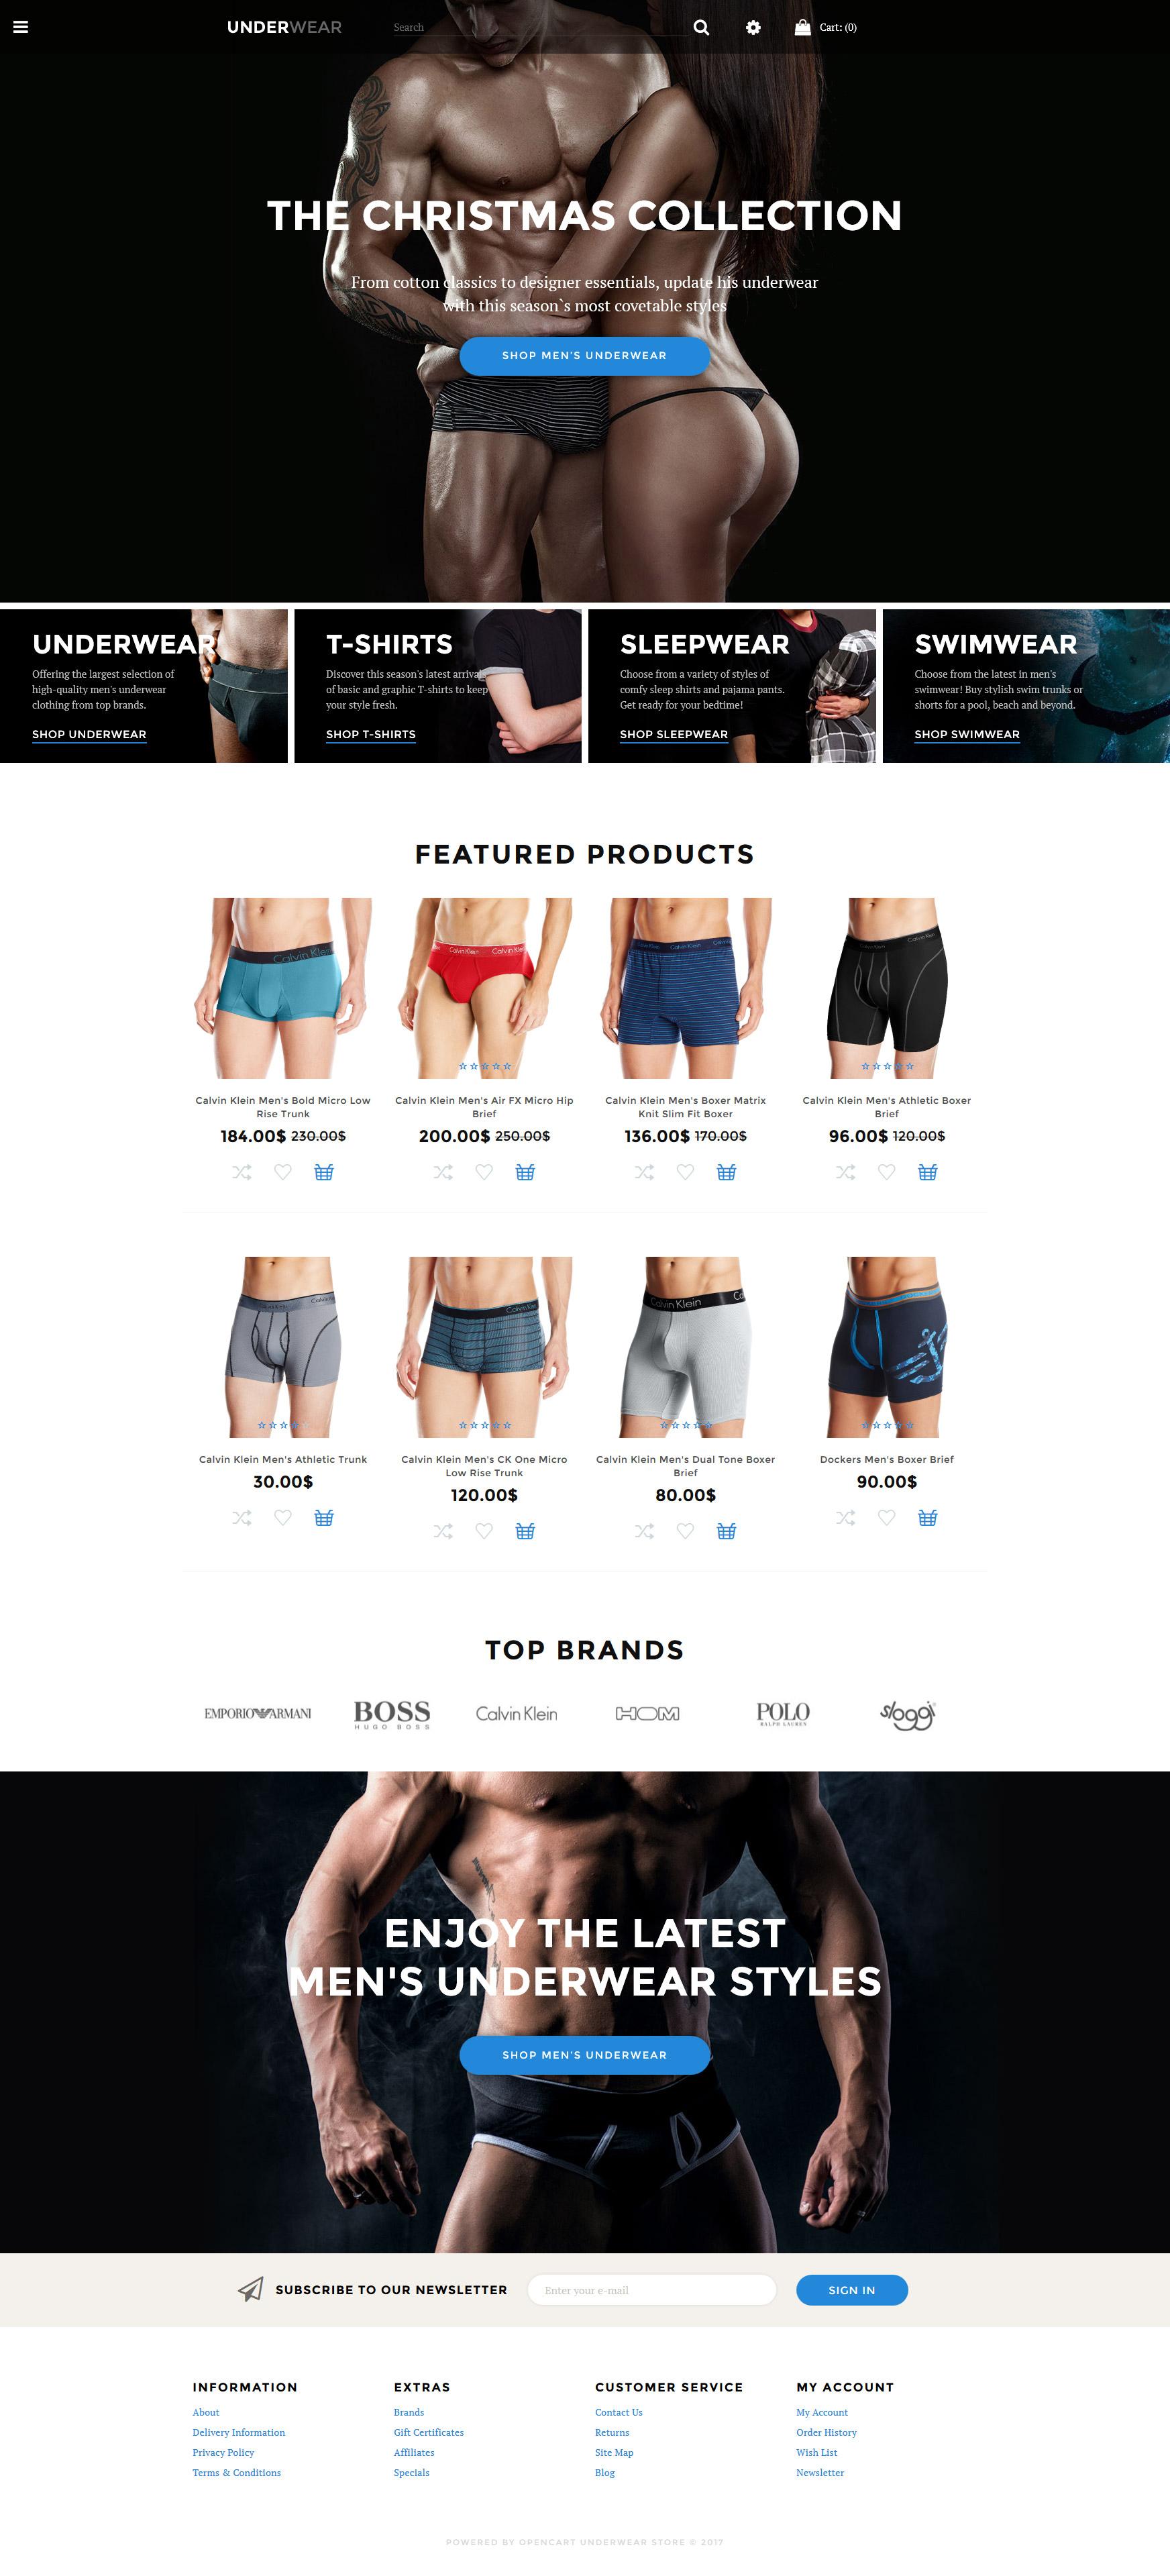 Underwear - Lingerie & Underwear Store OpenCart Template